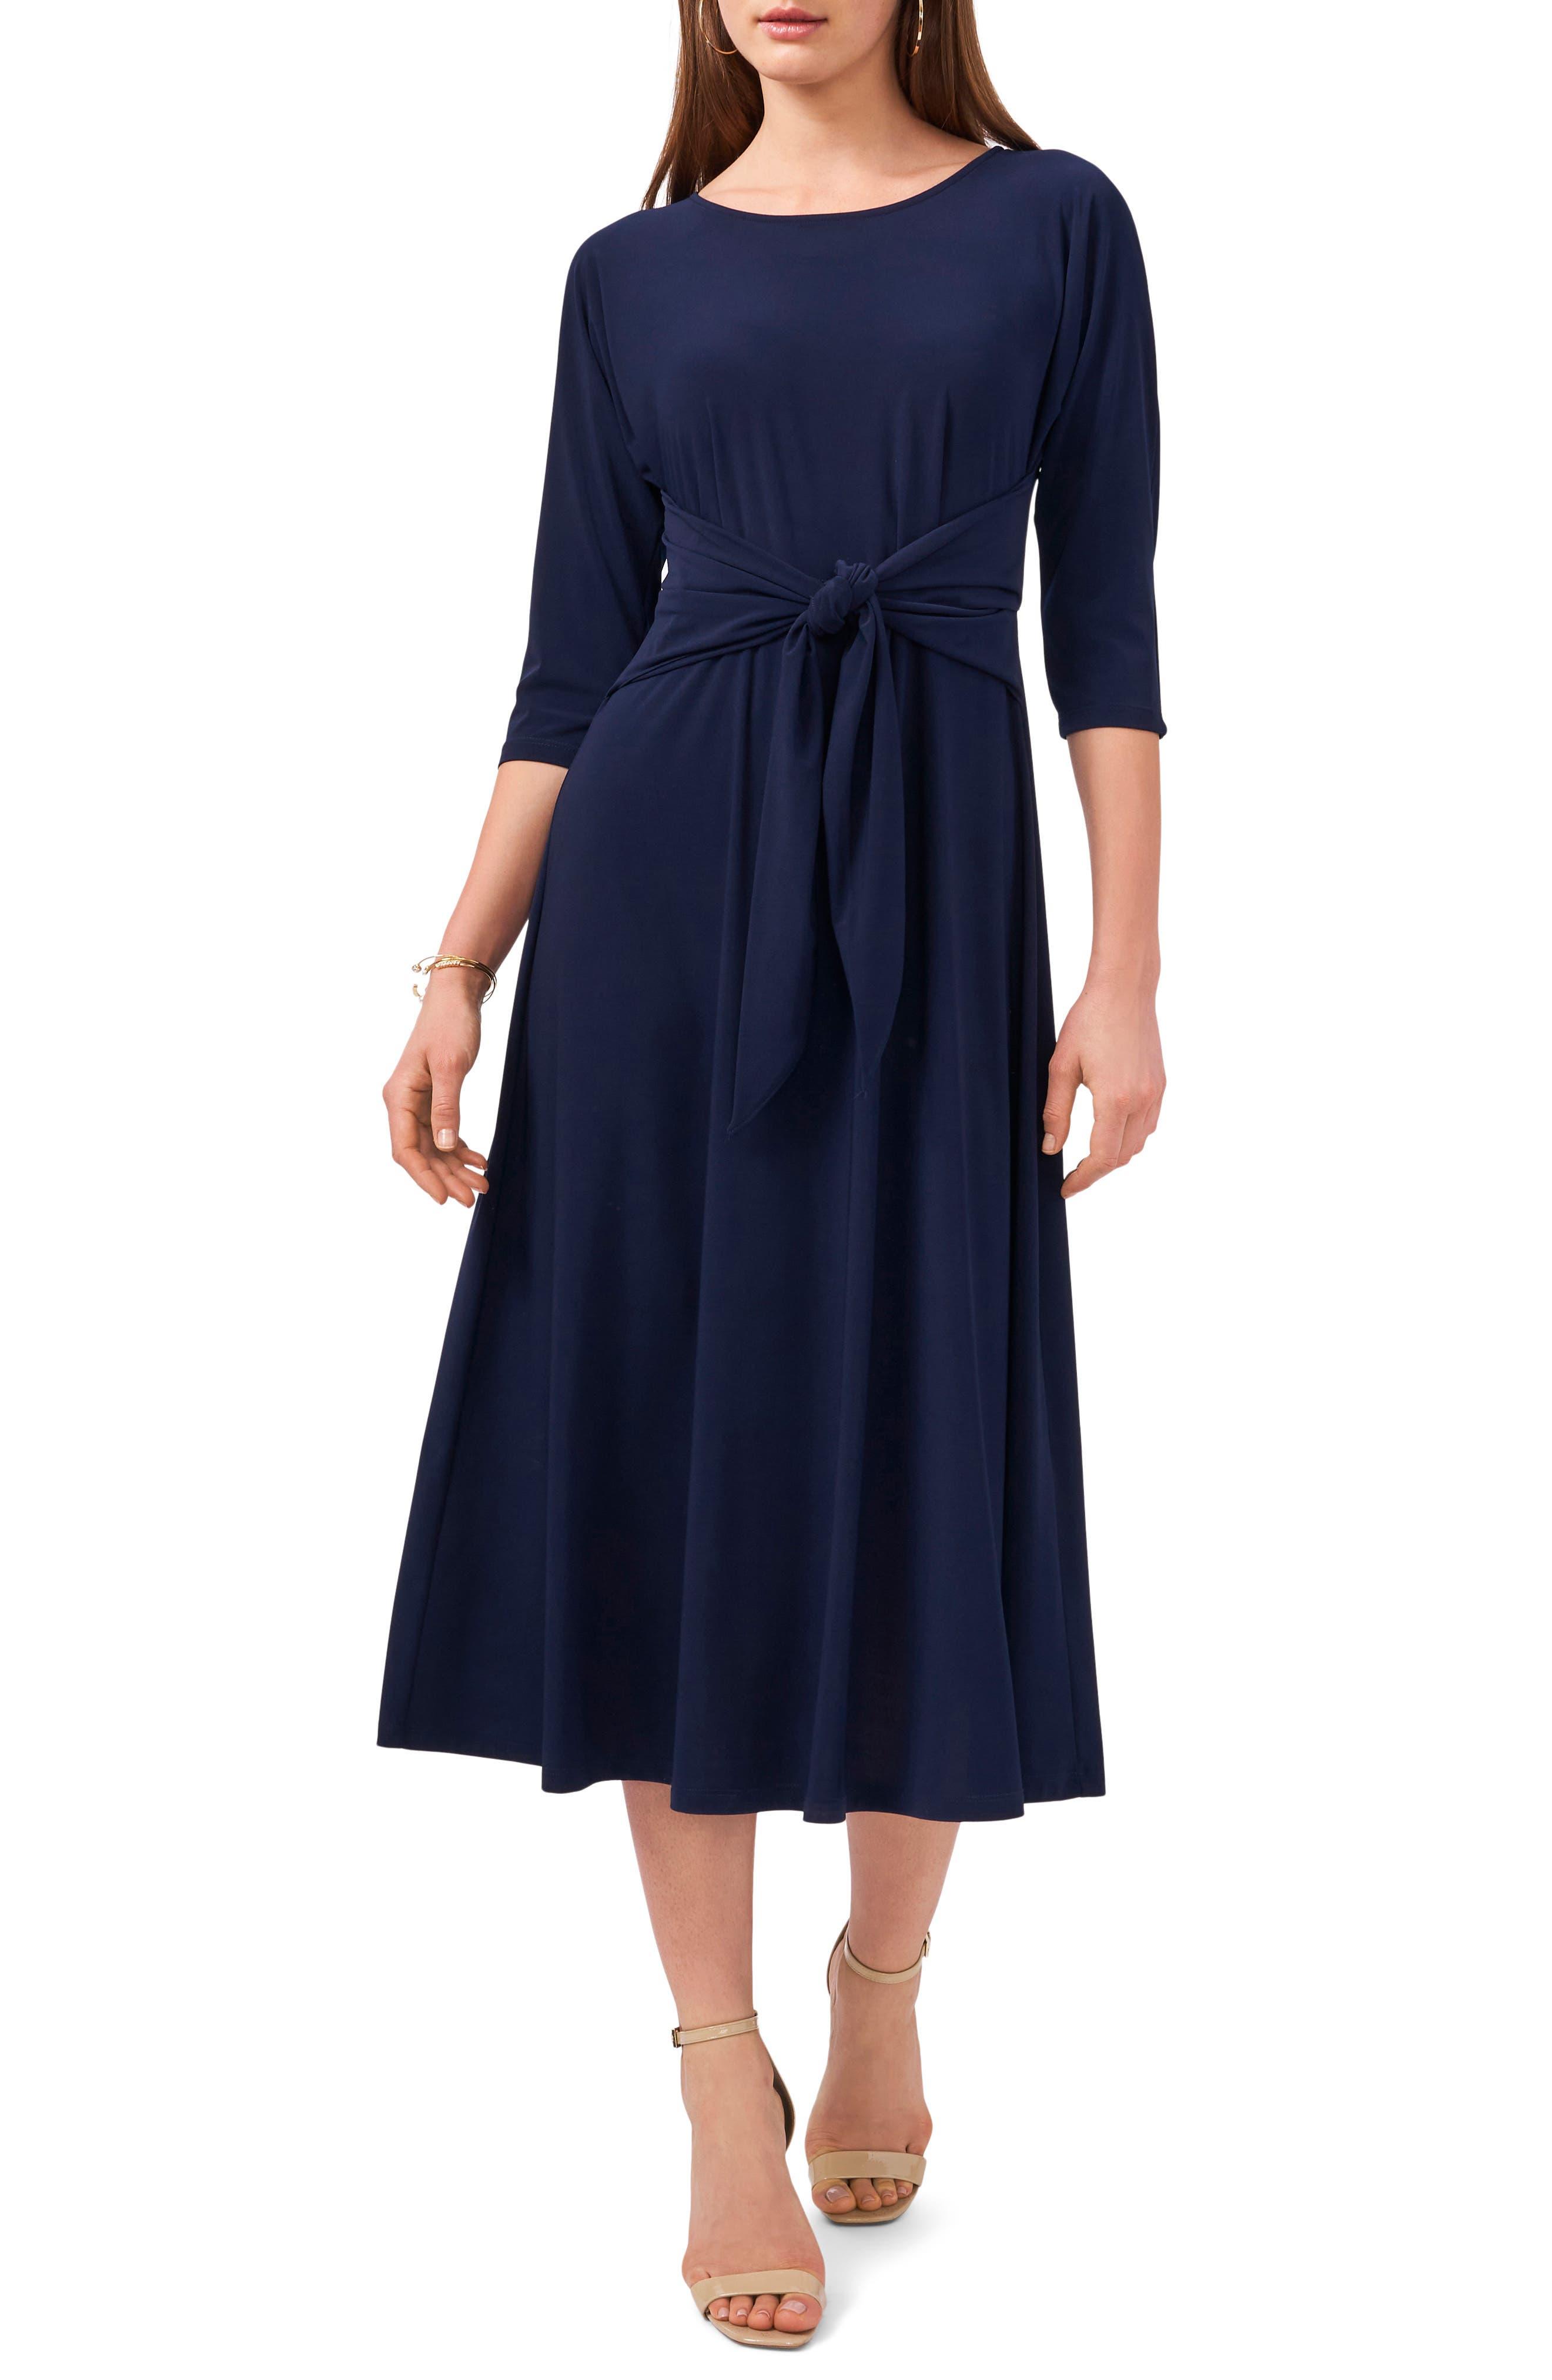 Tie Front Fit & Flare Midi Dress